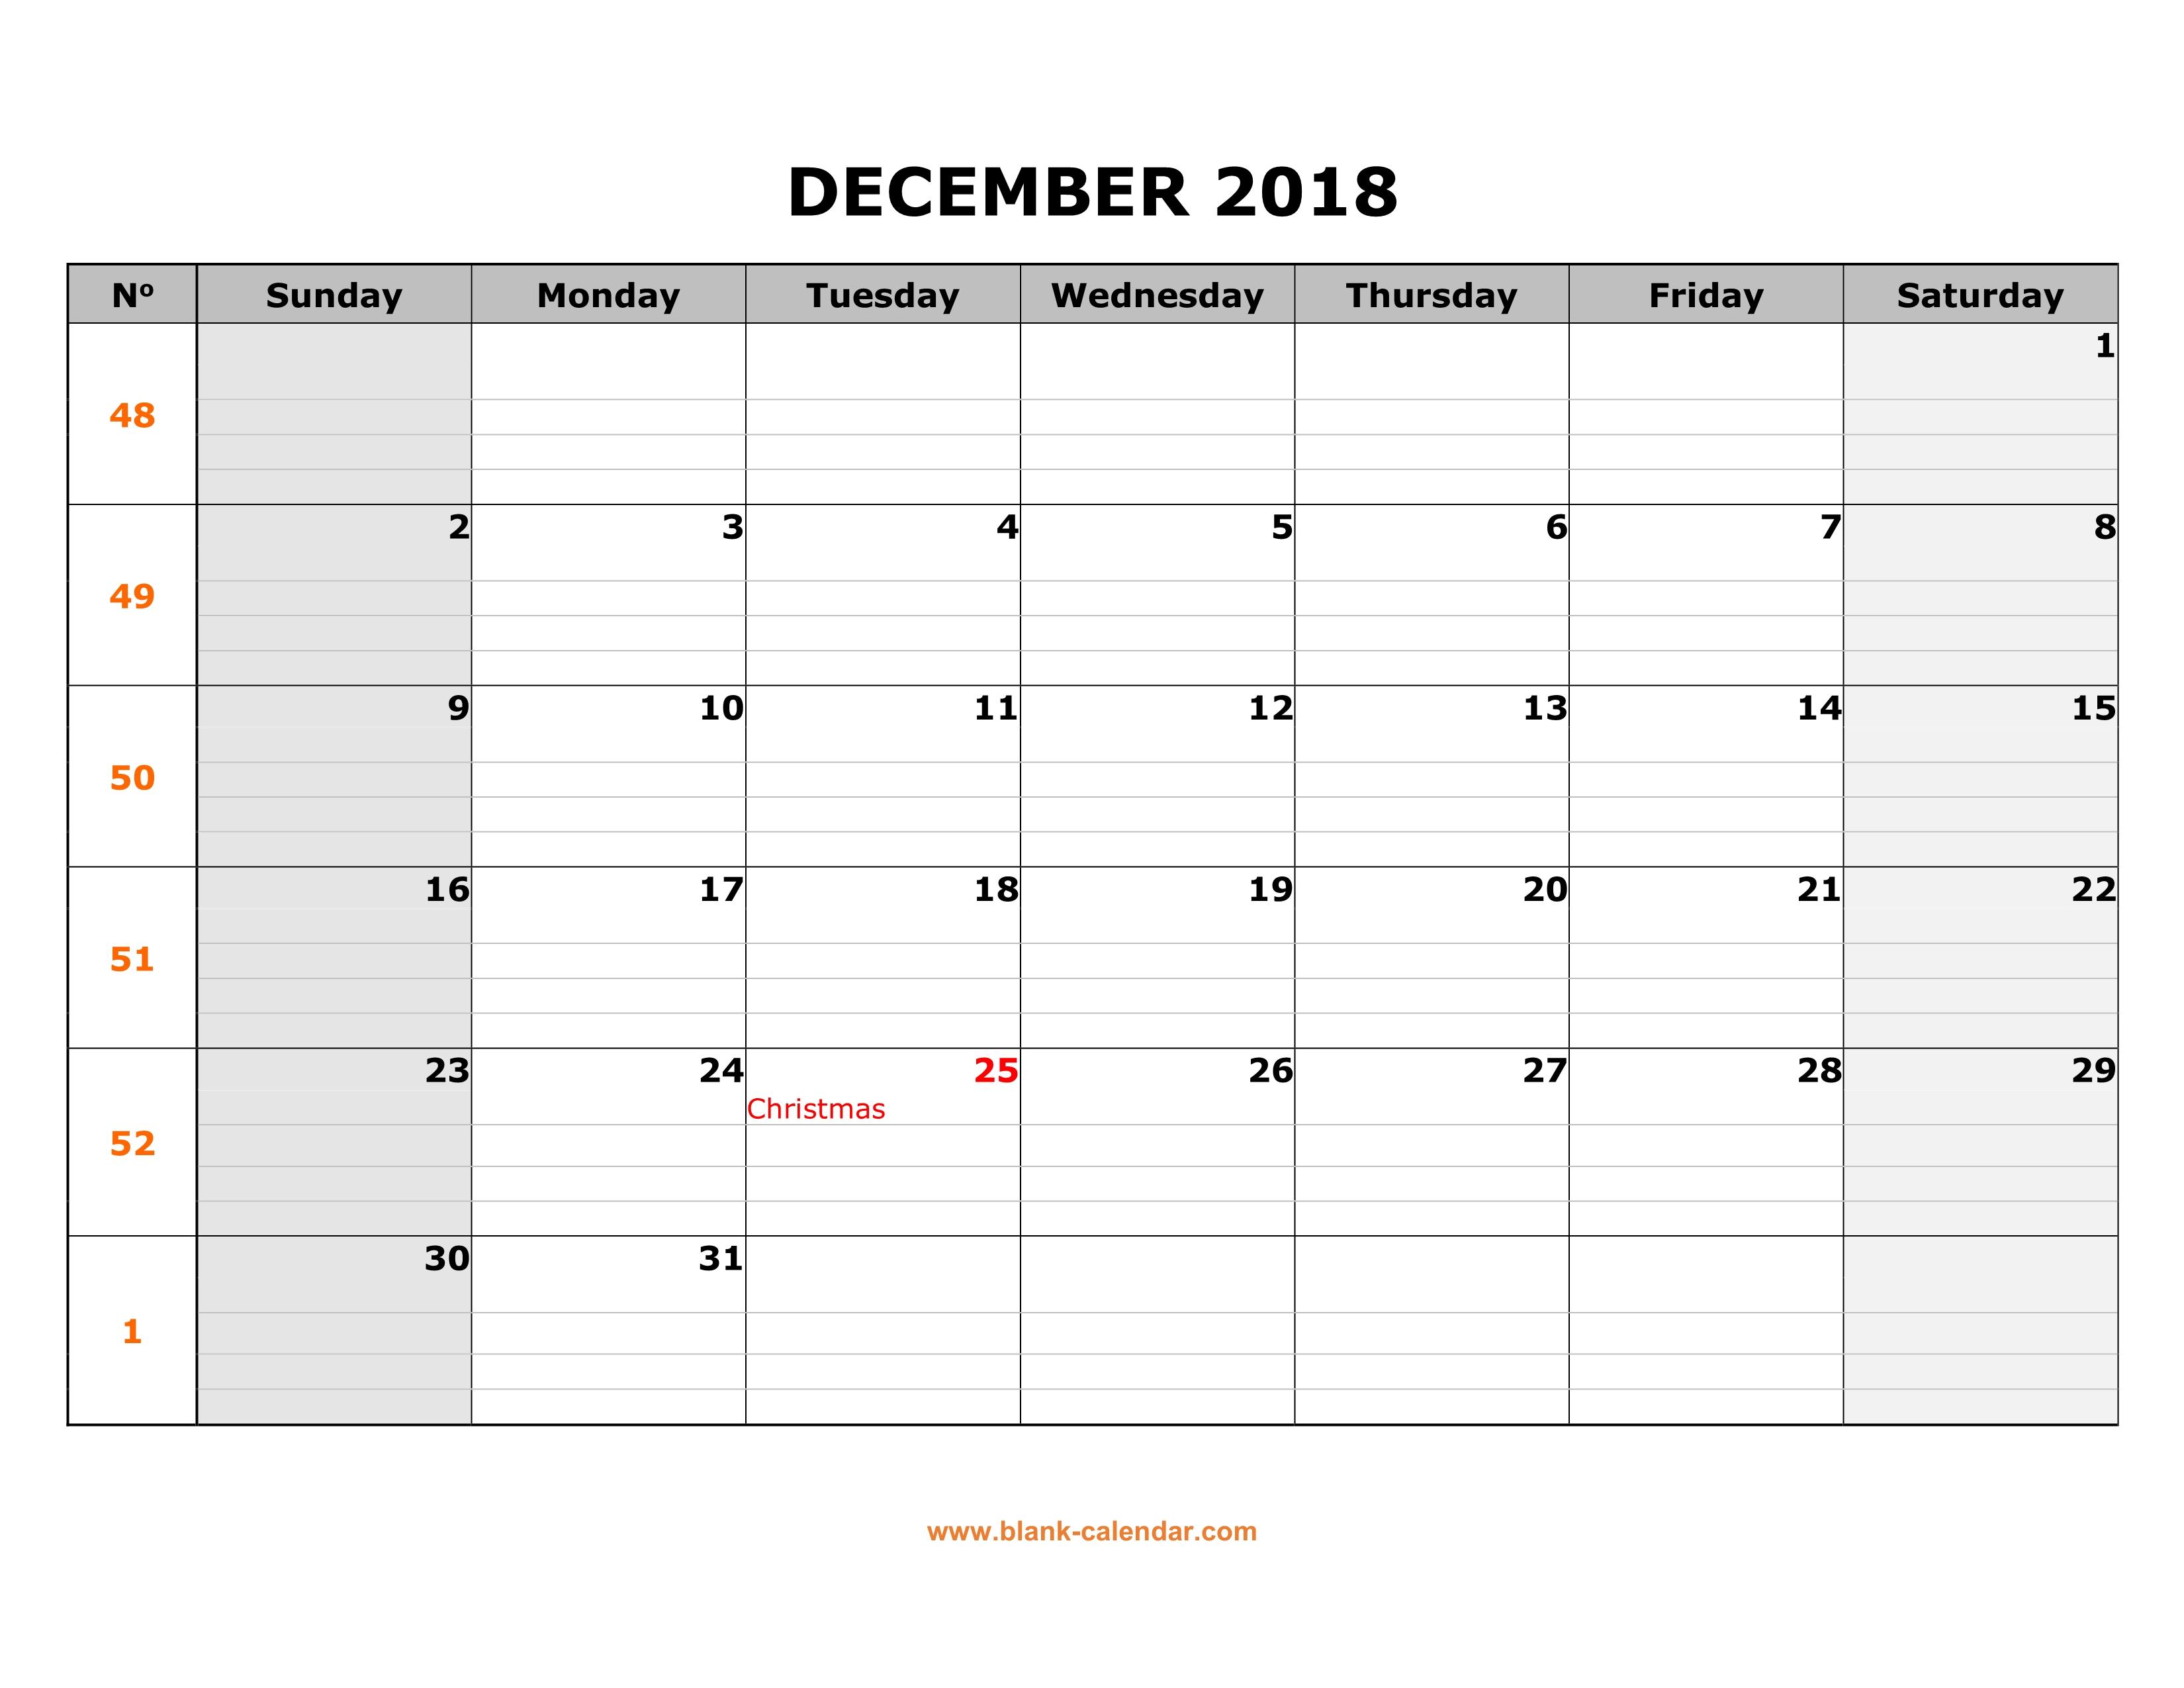 Free Download Printable December 2018 Calendar, Large Box Grid in Blank Printable December Calandar